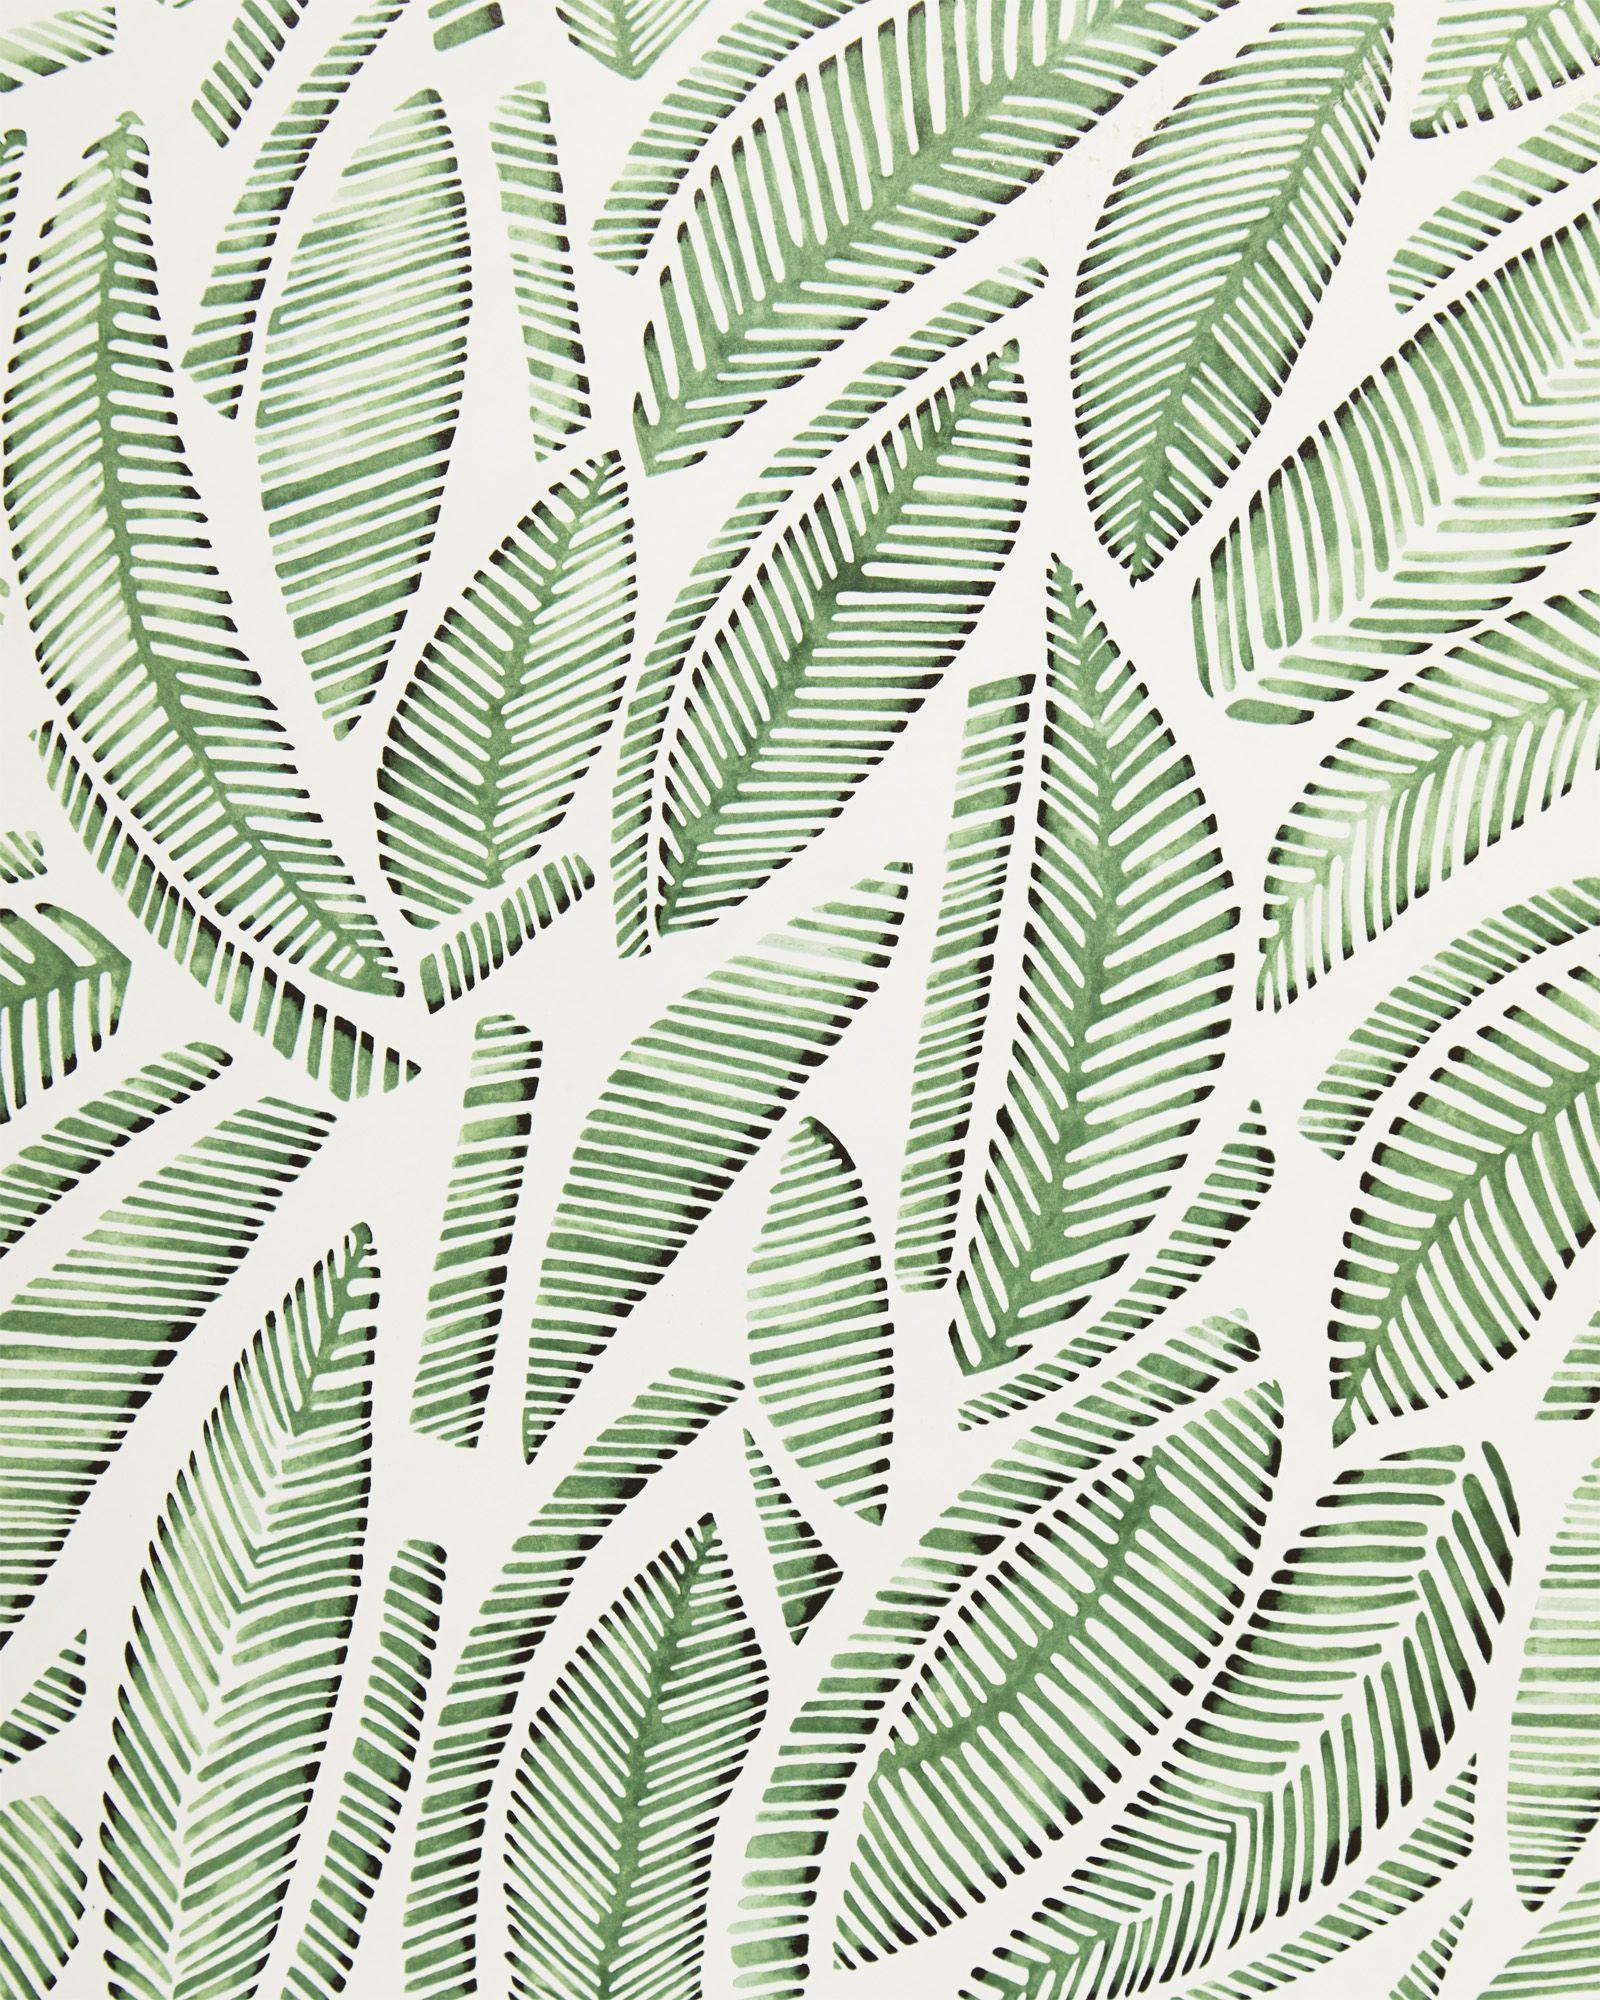 Serena & Lily Fallbrook Wallpaper Swatch Palm wallpaper